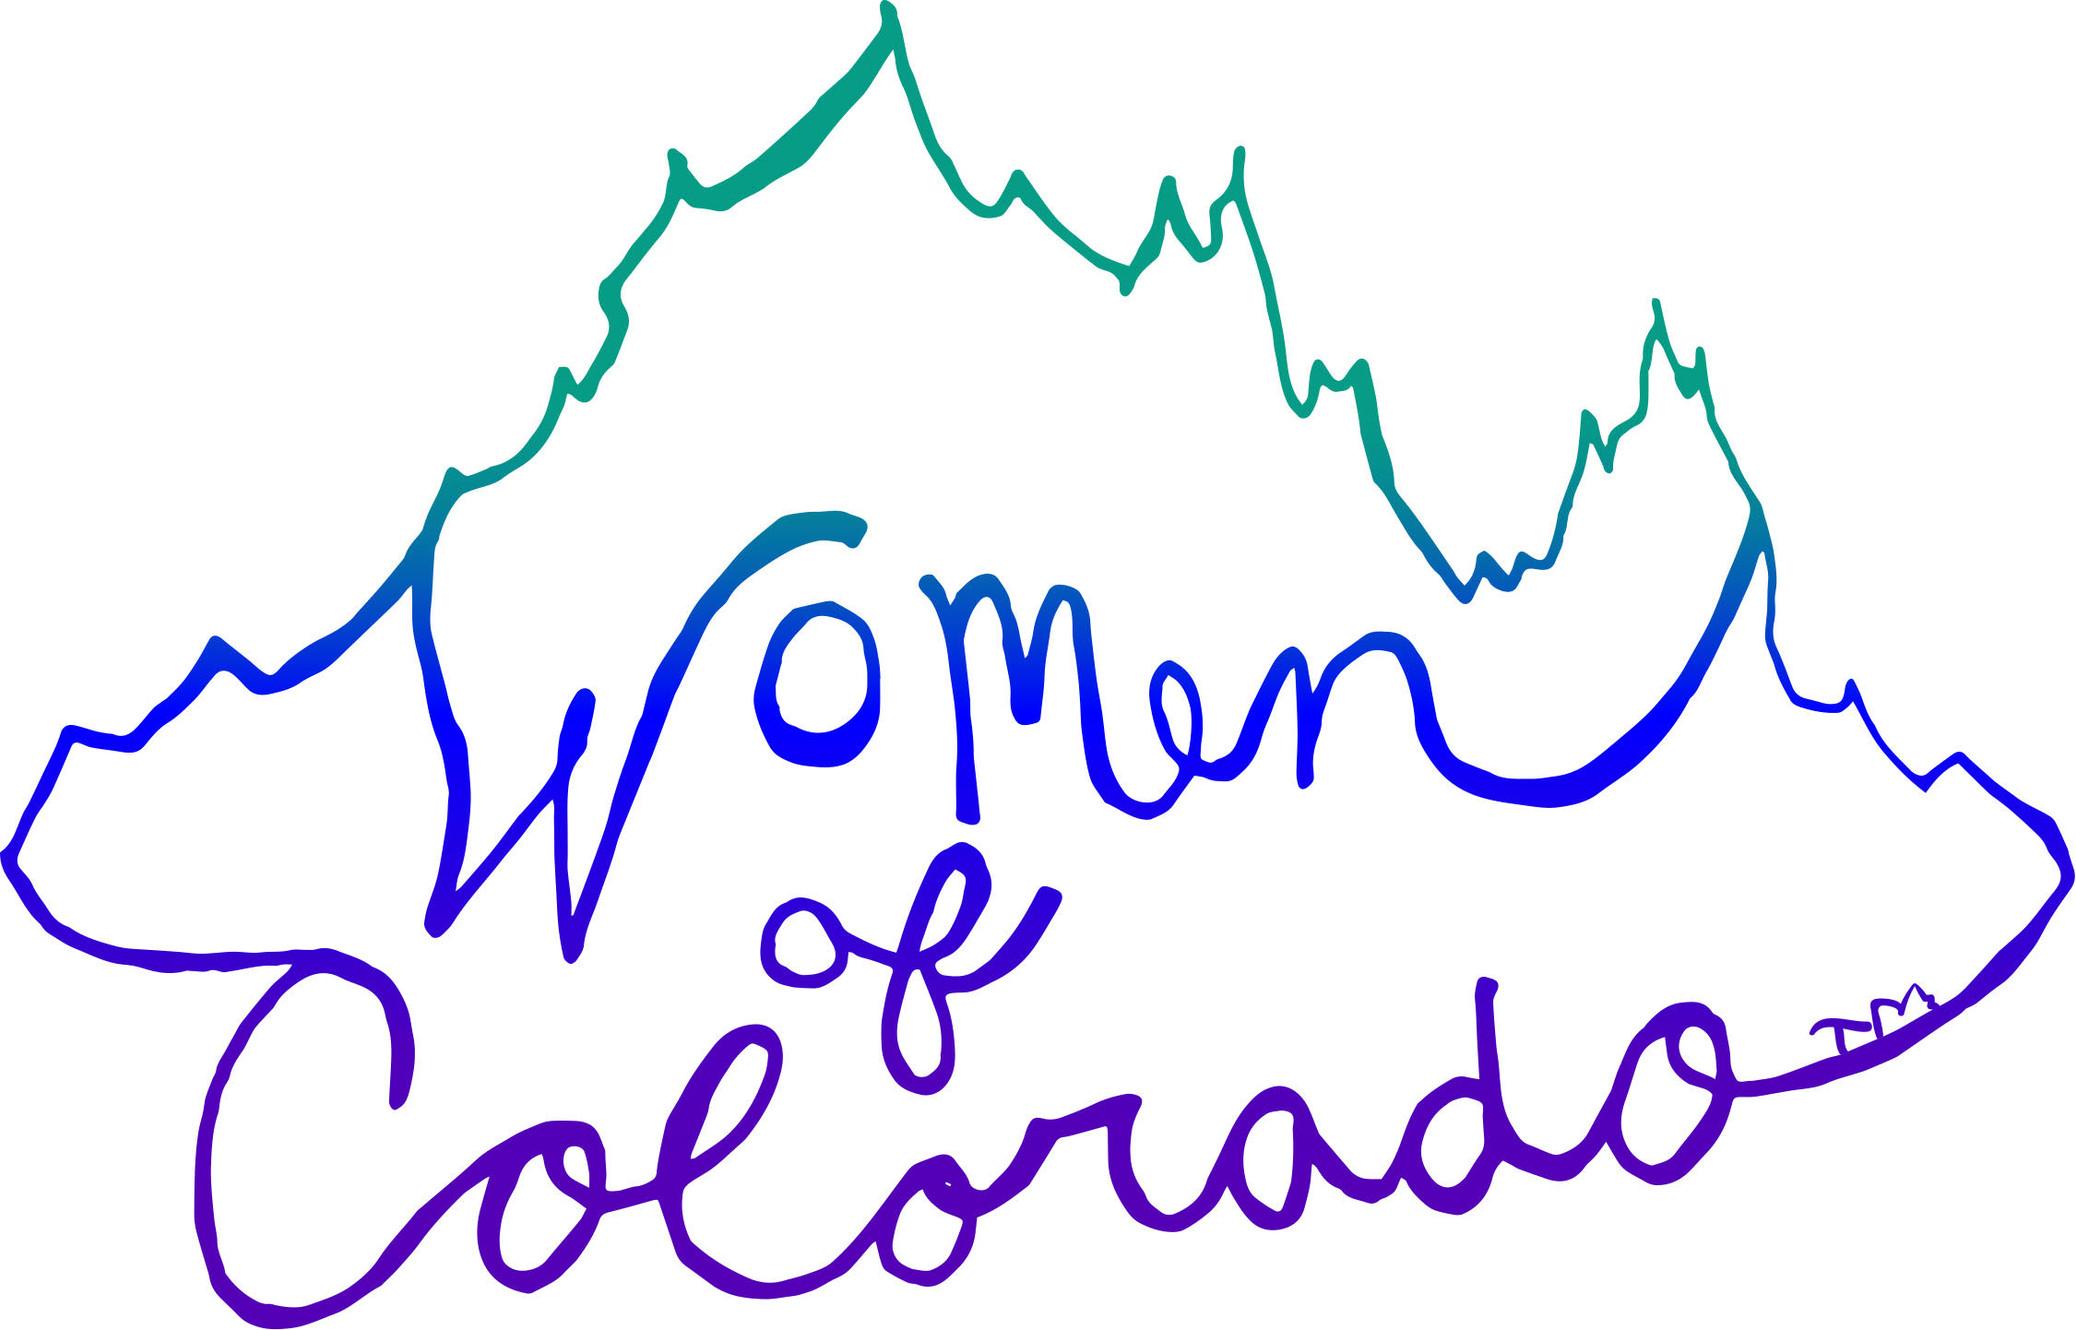 Women of Colorado | Ambassadors